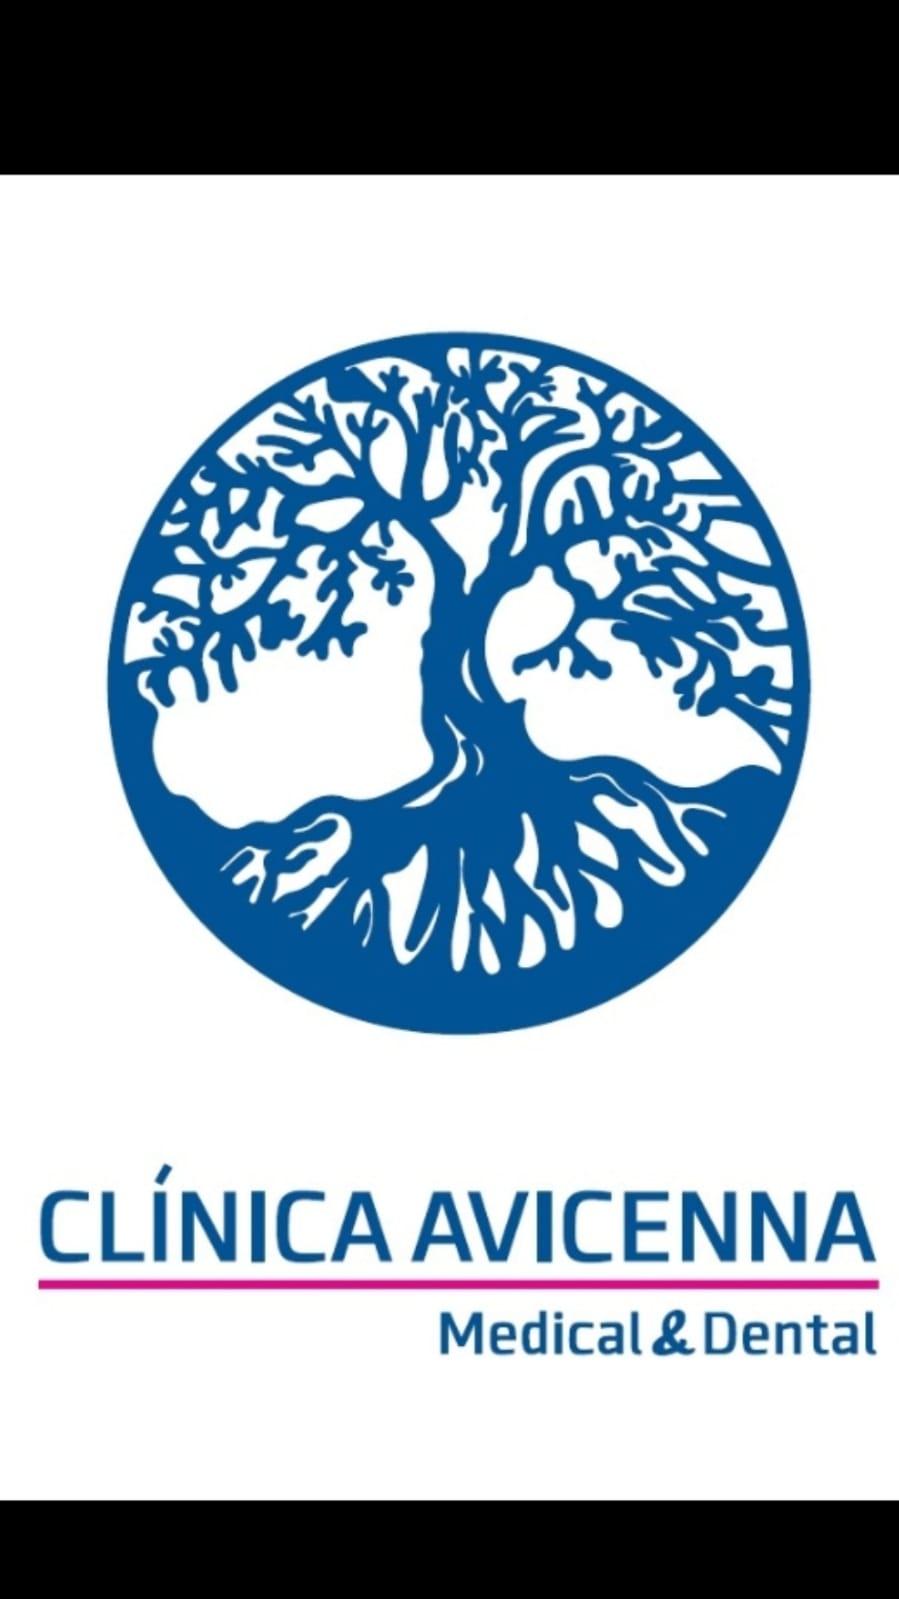 Clinica Avicenna